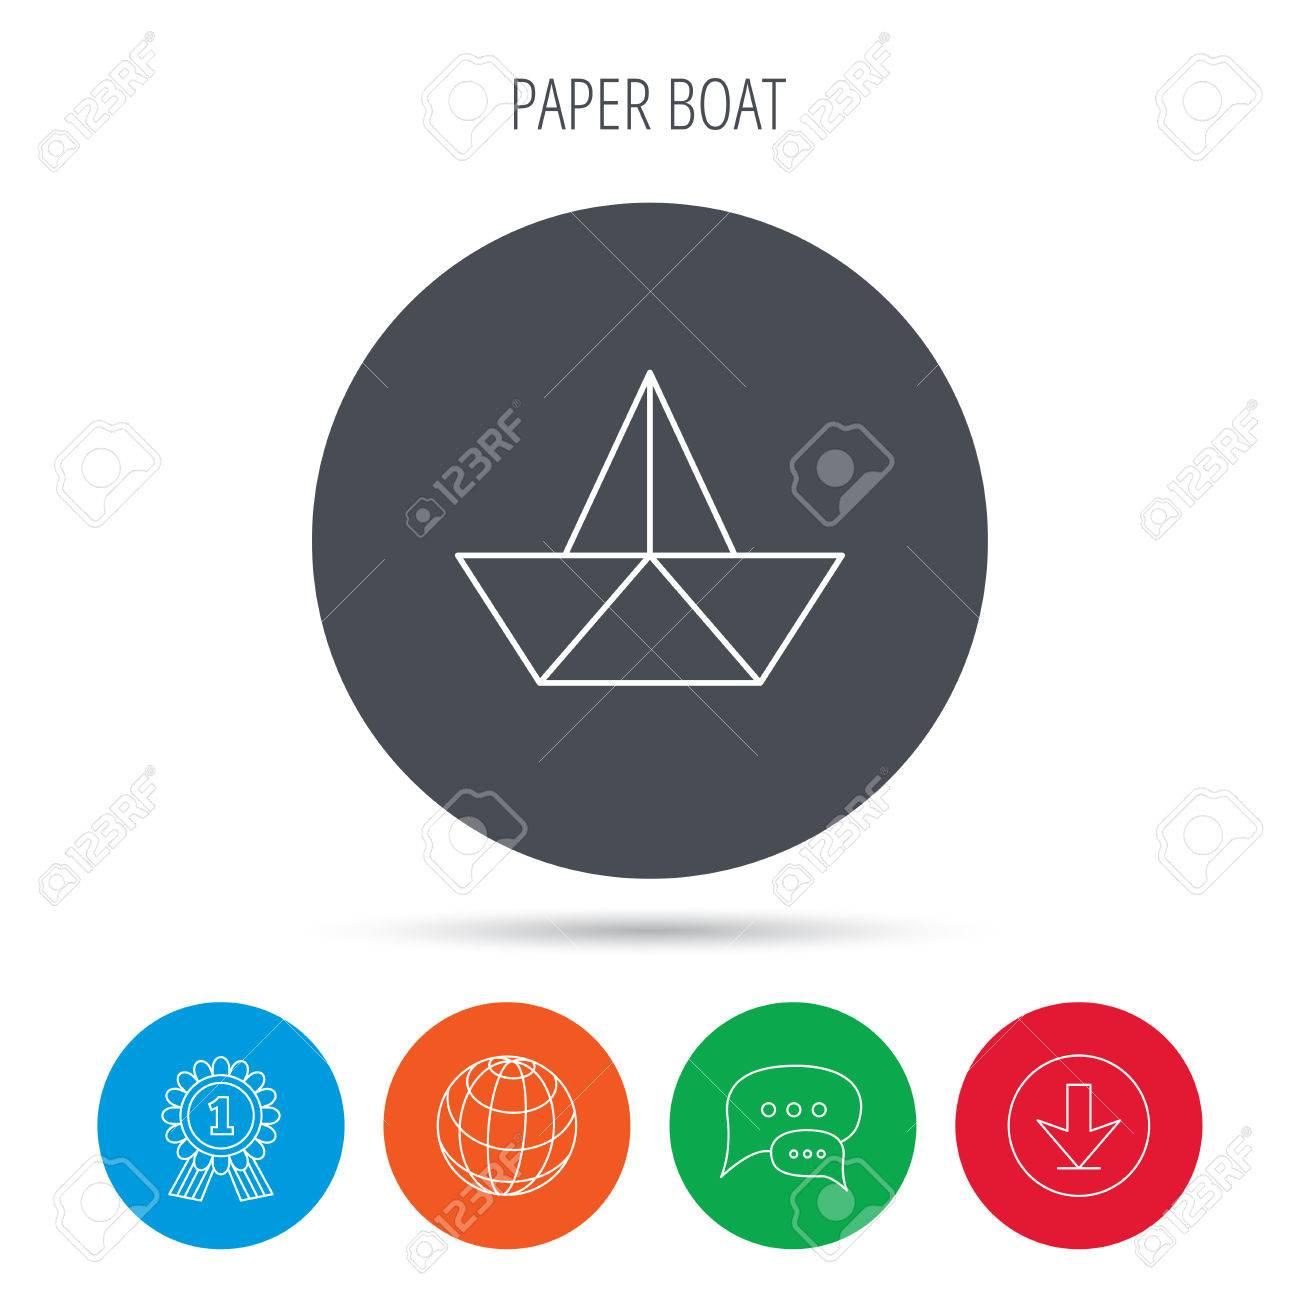 Paper boat icon origami ship sign sailing symbol globe paper boat icon origami ship sign sailing symbol globe download and speech buycottarizona